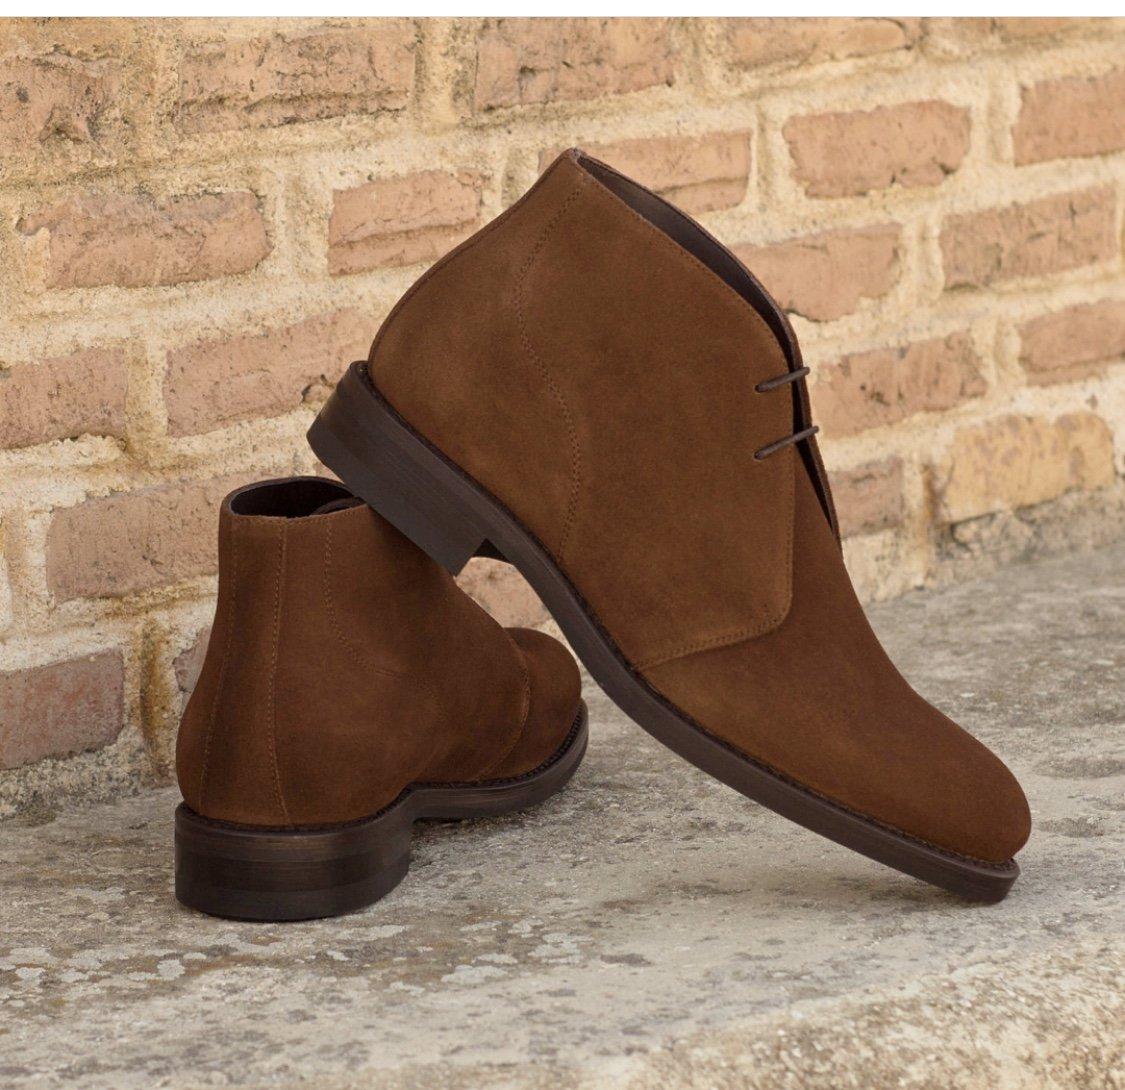 Designing Custom Shoes for Men Suede